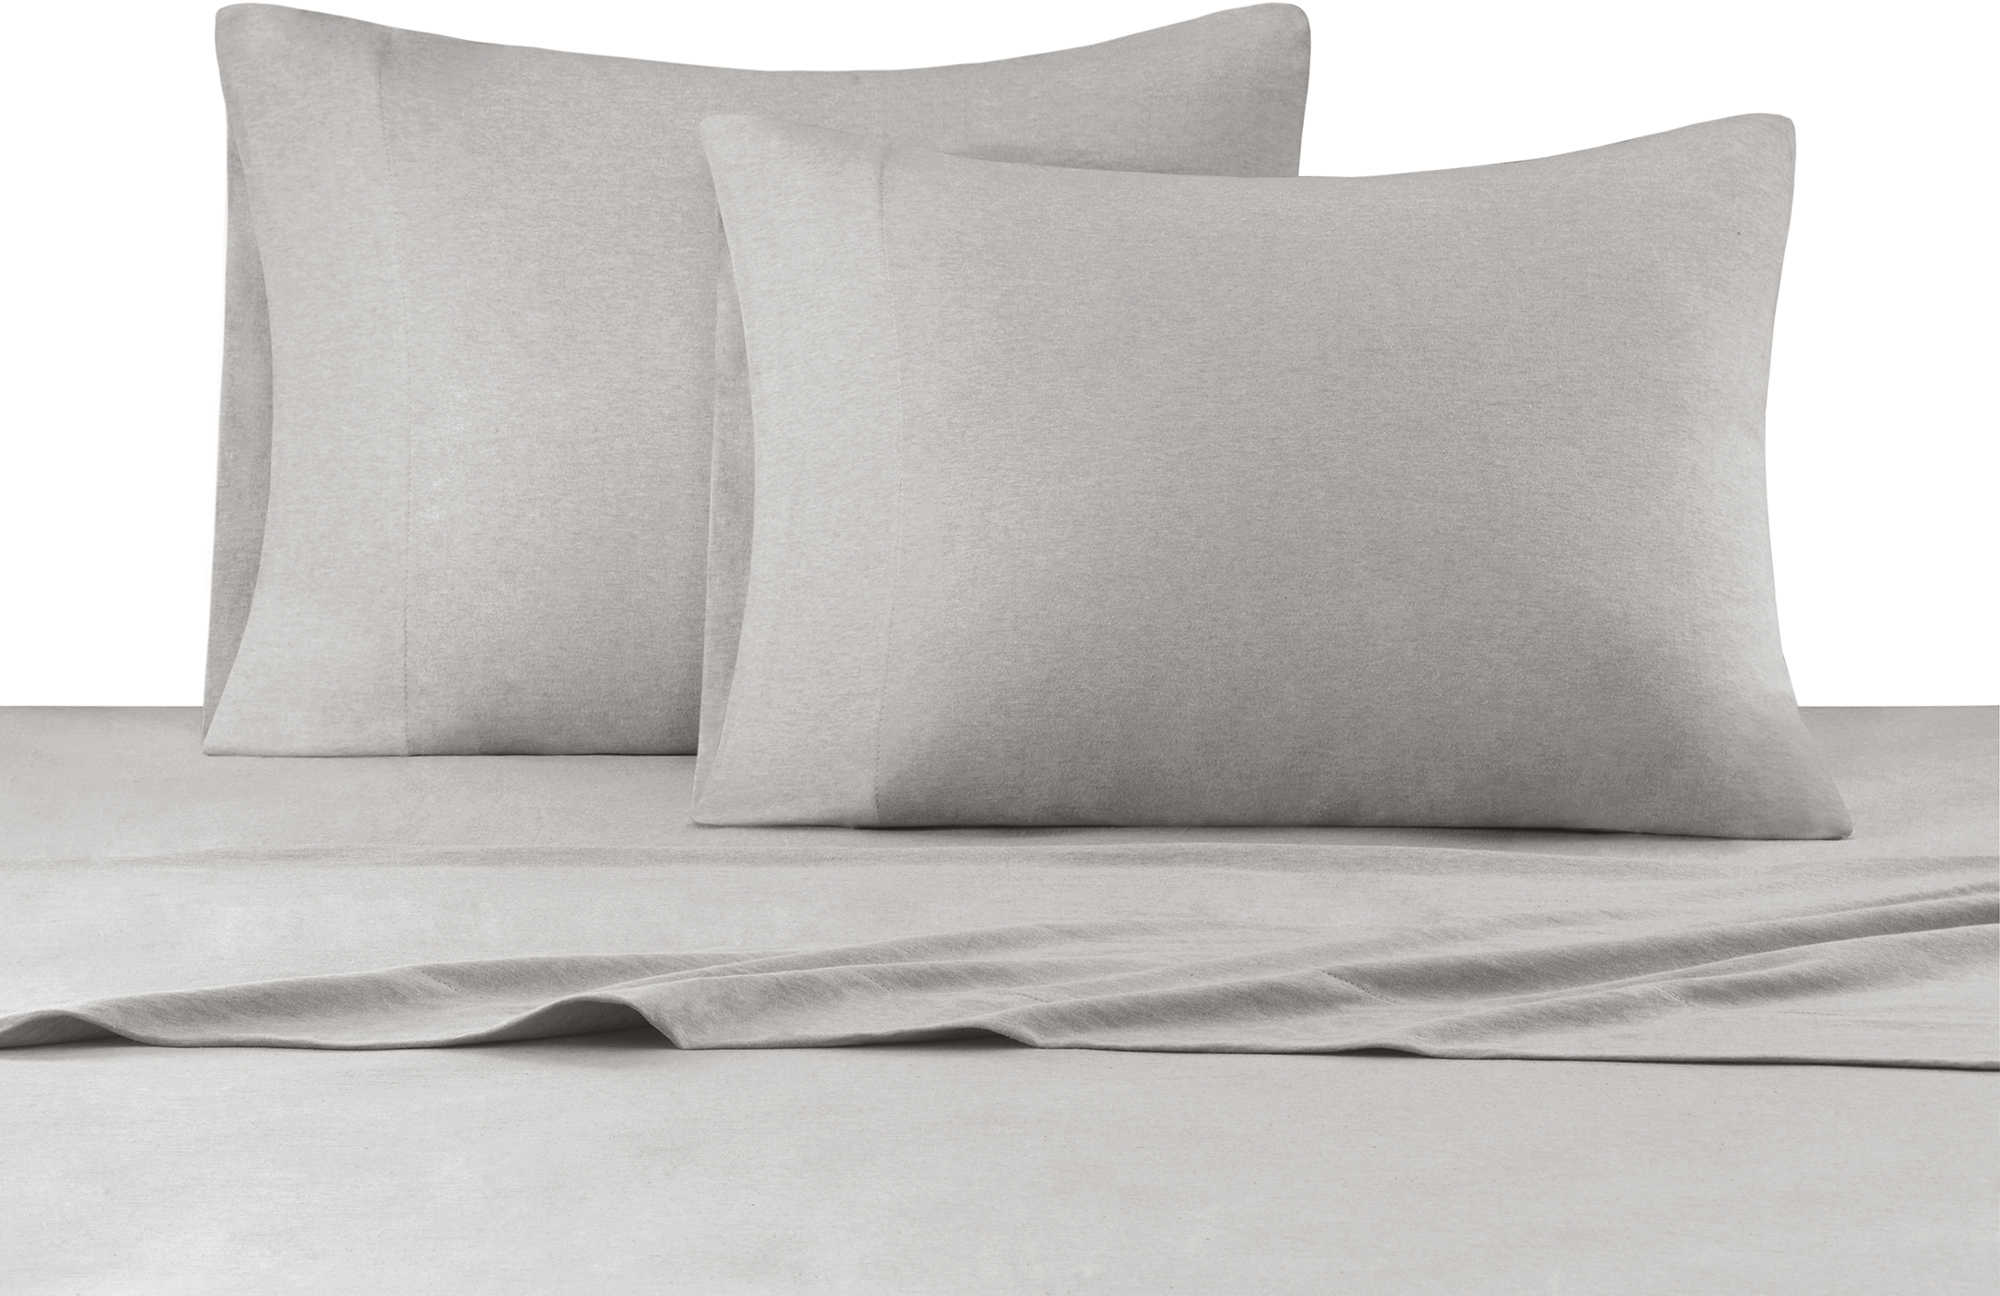 INK+IVY Heathered Cotton Jersey Knit Sheet Set - Bed Bath & Beyond